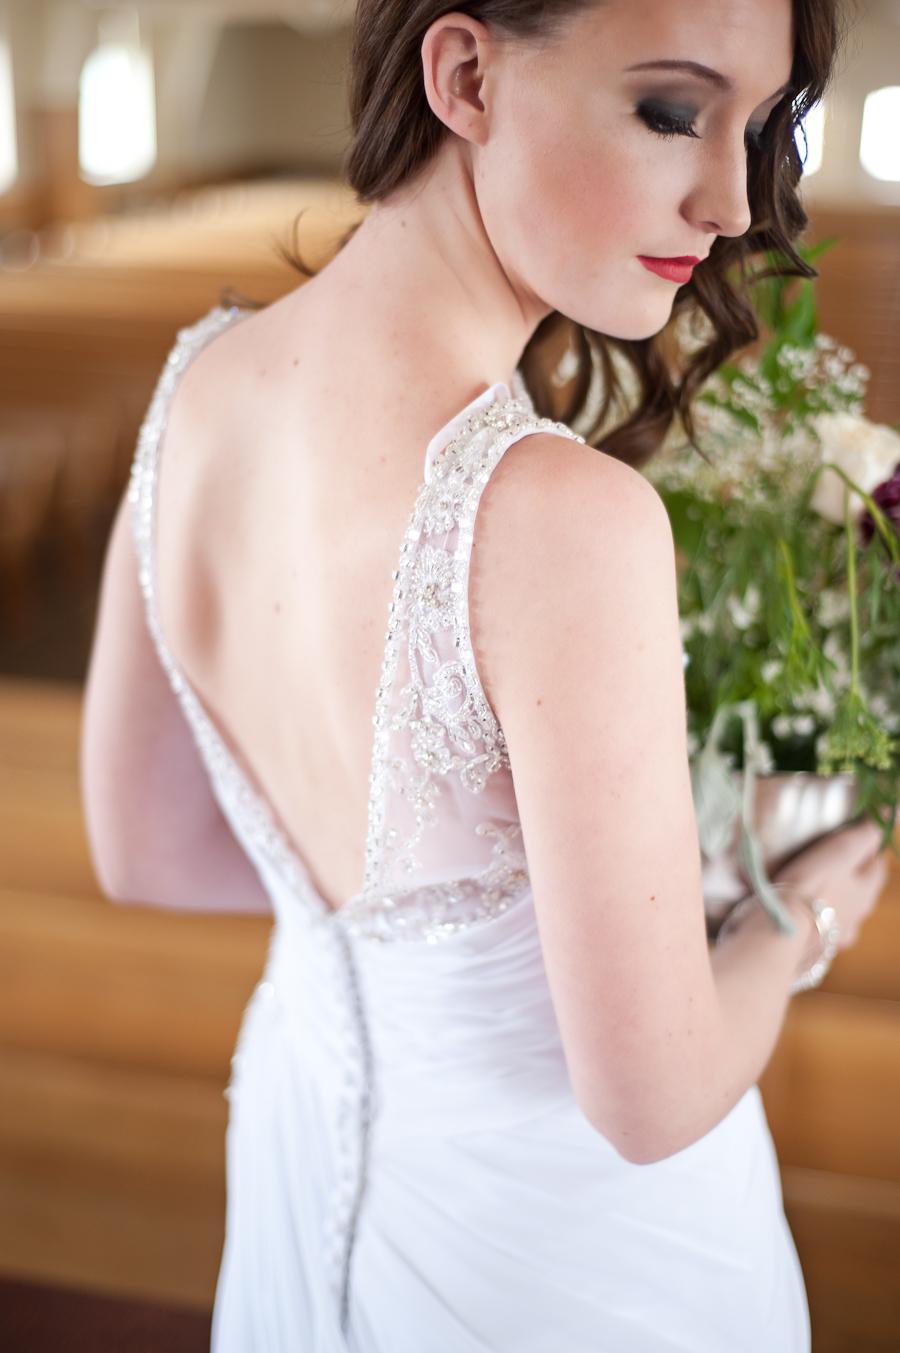 Susannah_Deangelo_Antique_Silver_Music_Hall_Wedding-41.jpg